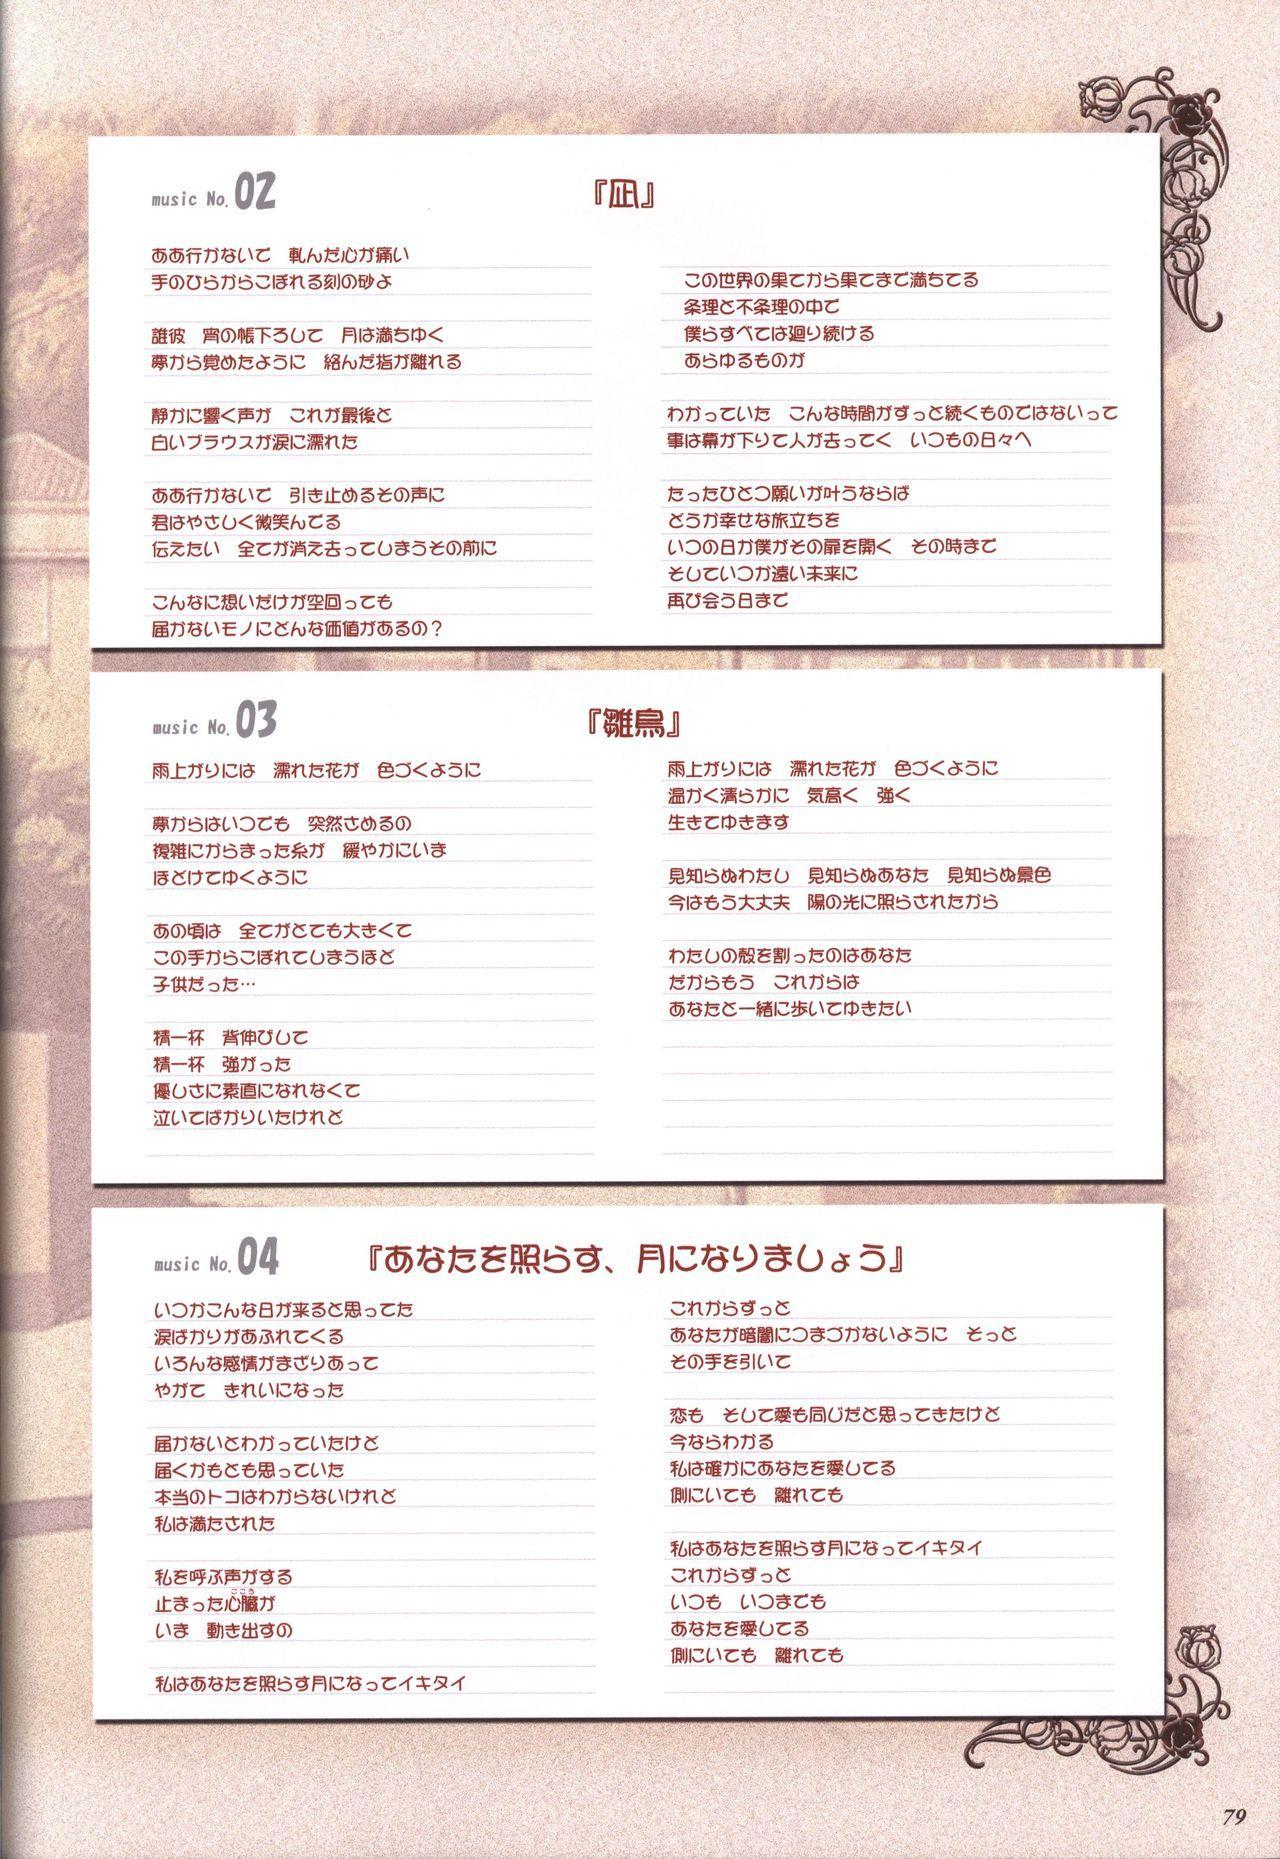 Moshimo Ashita ga Harenaraba official fanbook 79